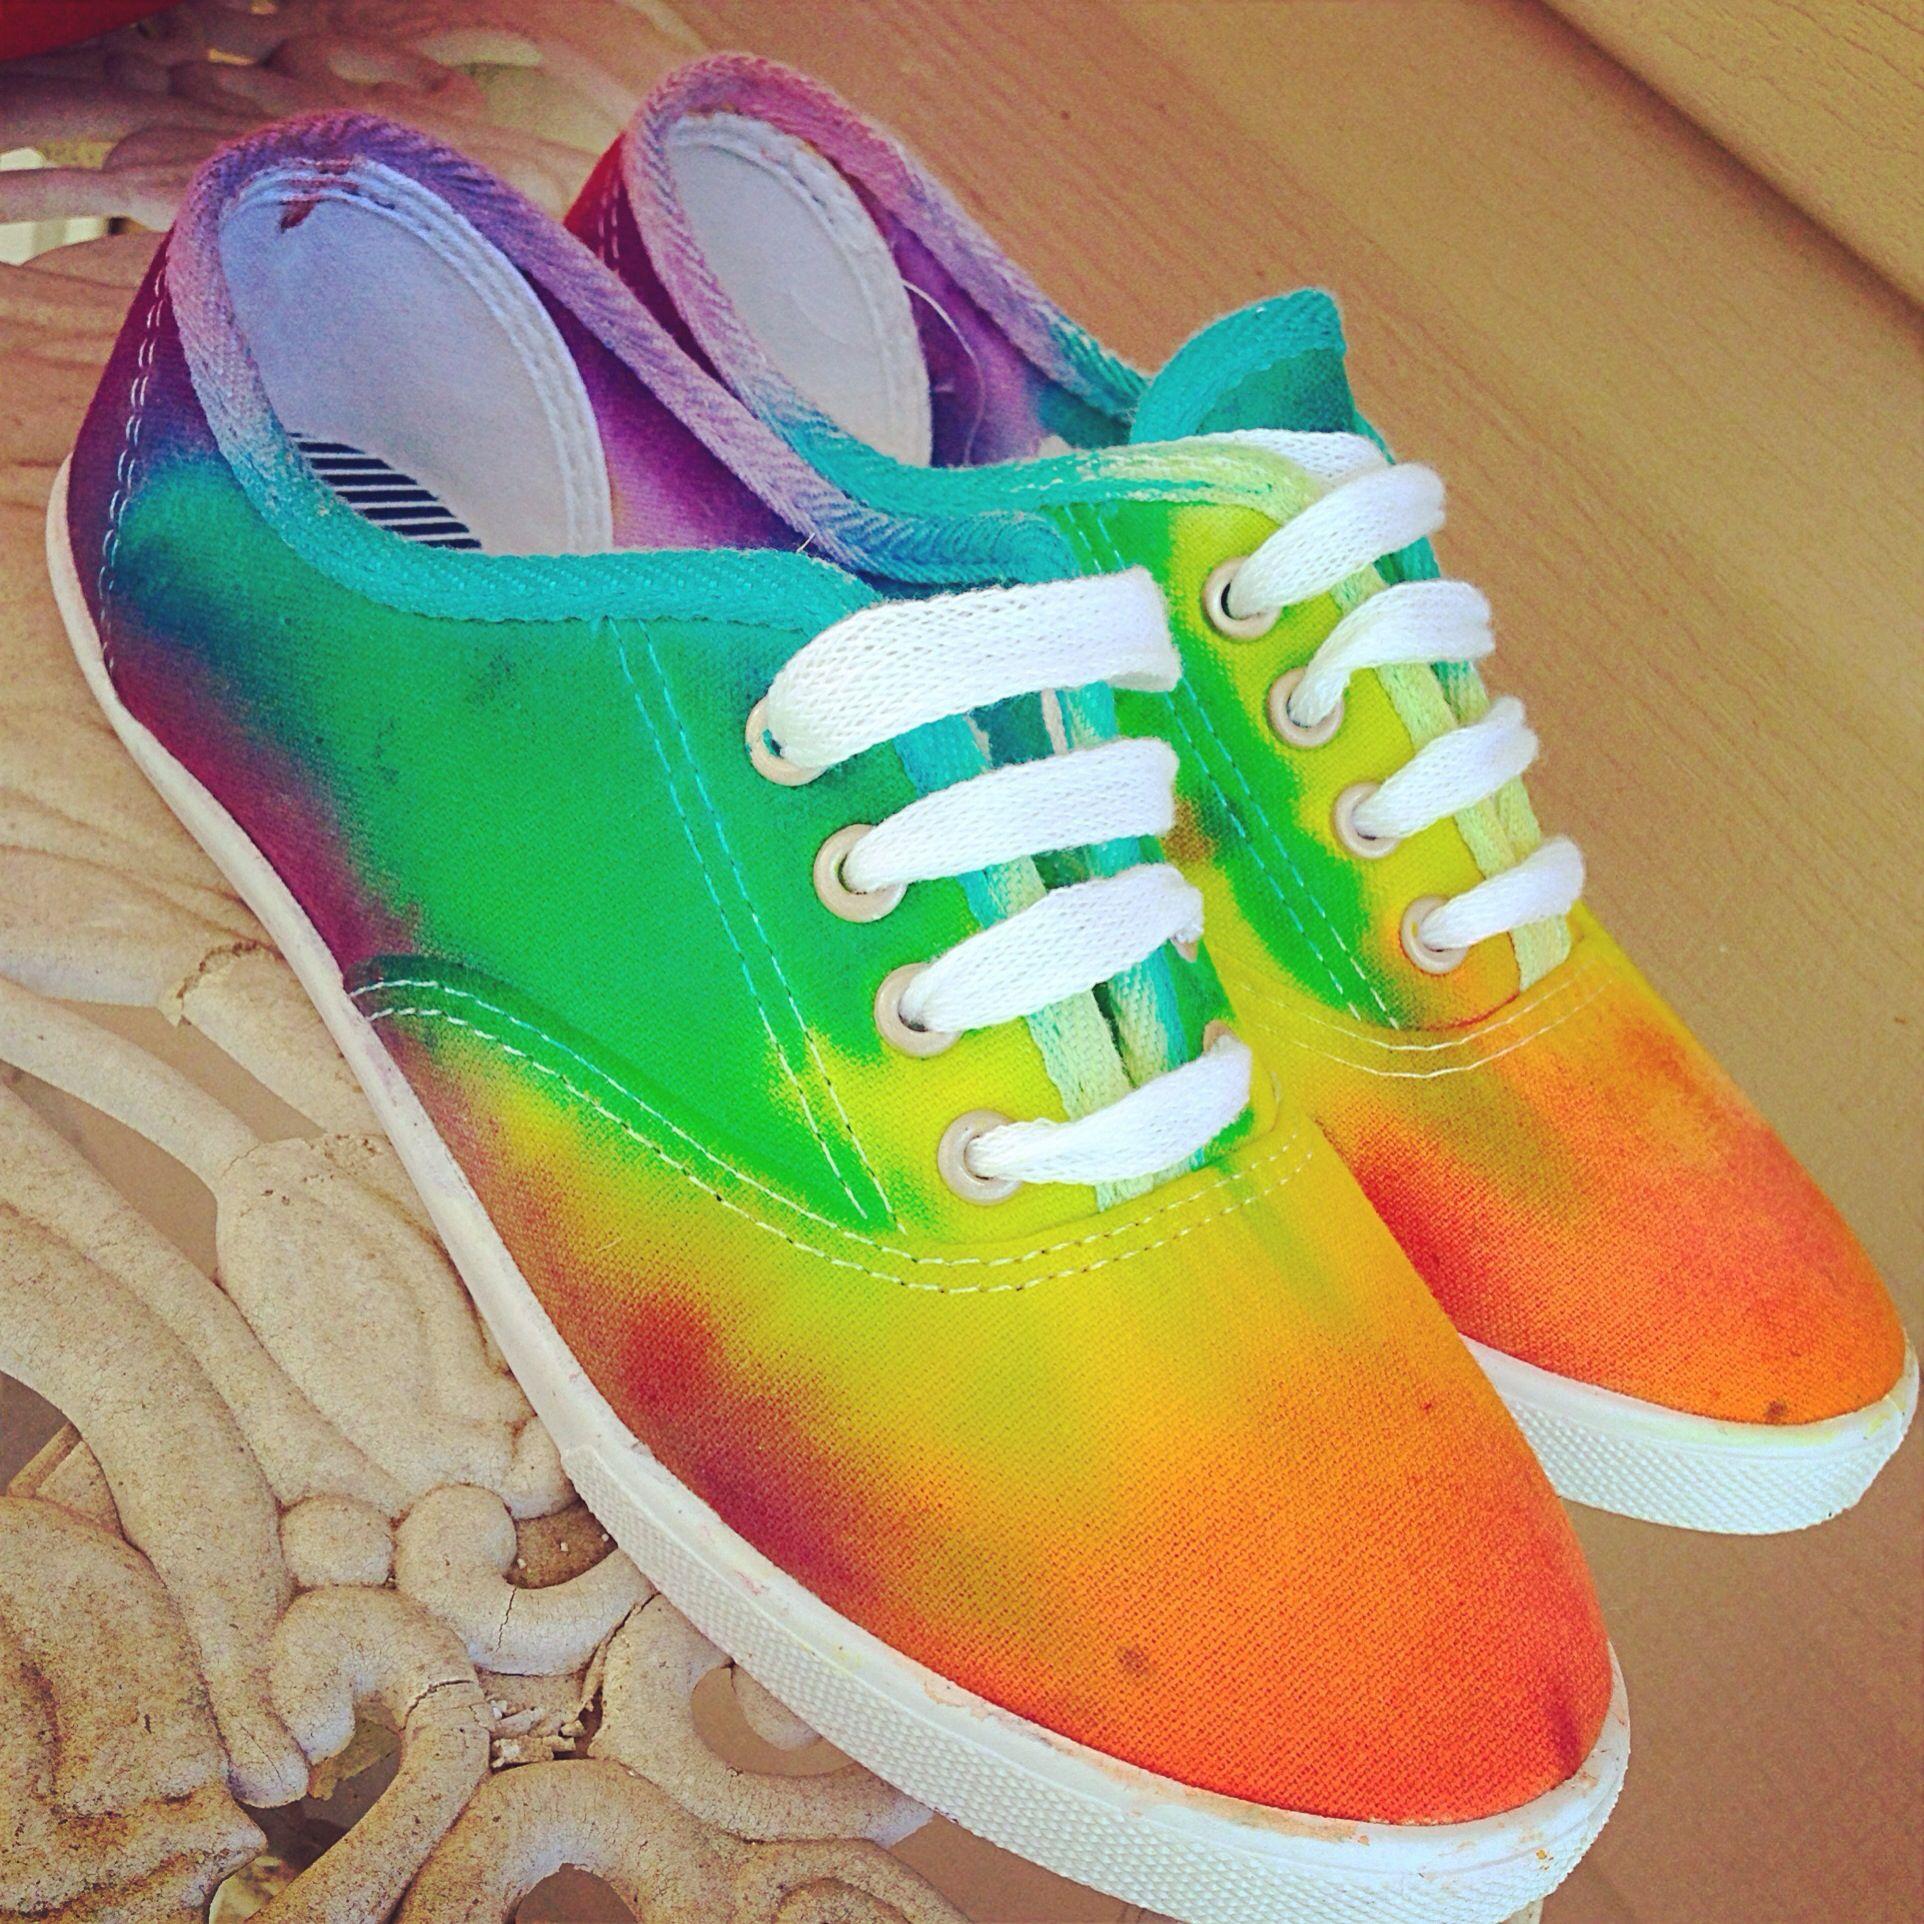 nike free express rainbow preschool crafts